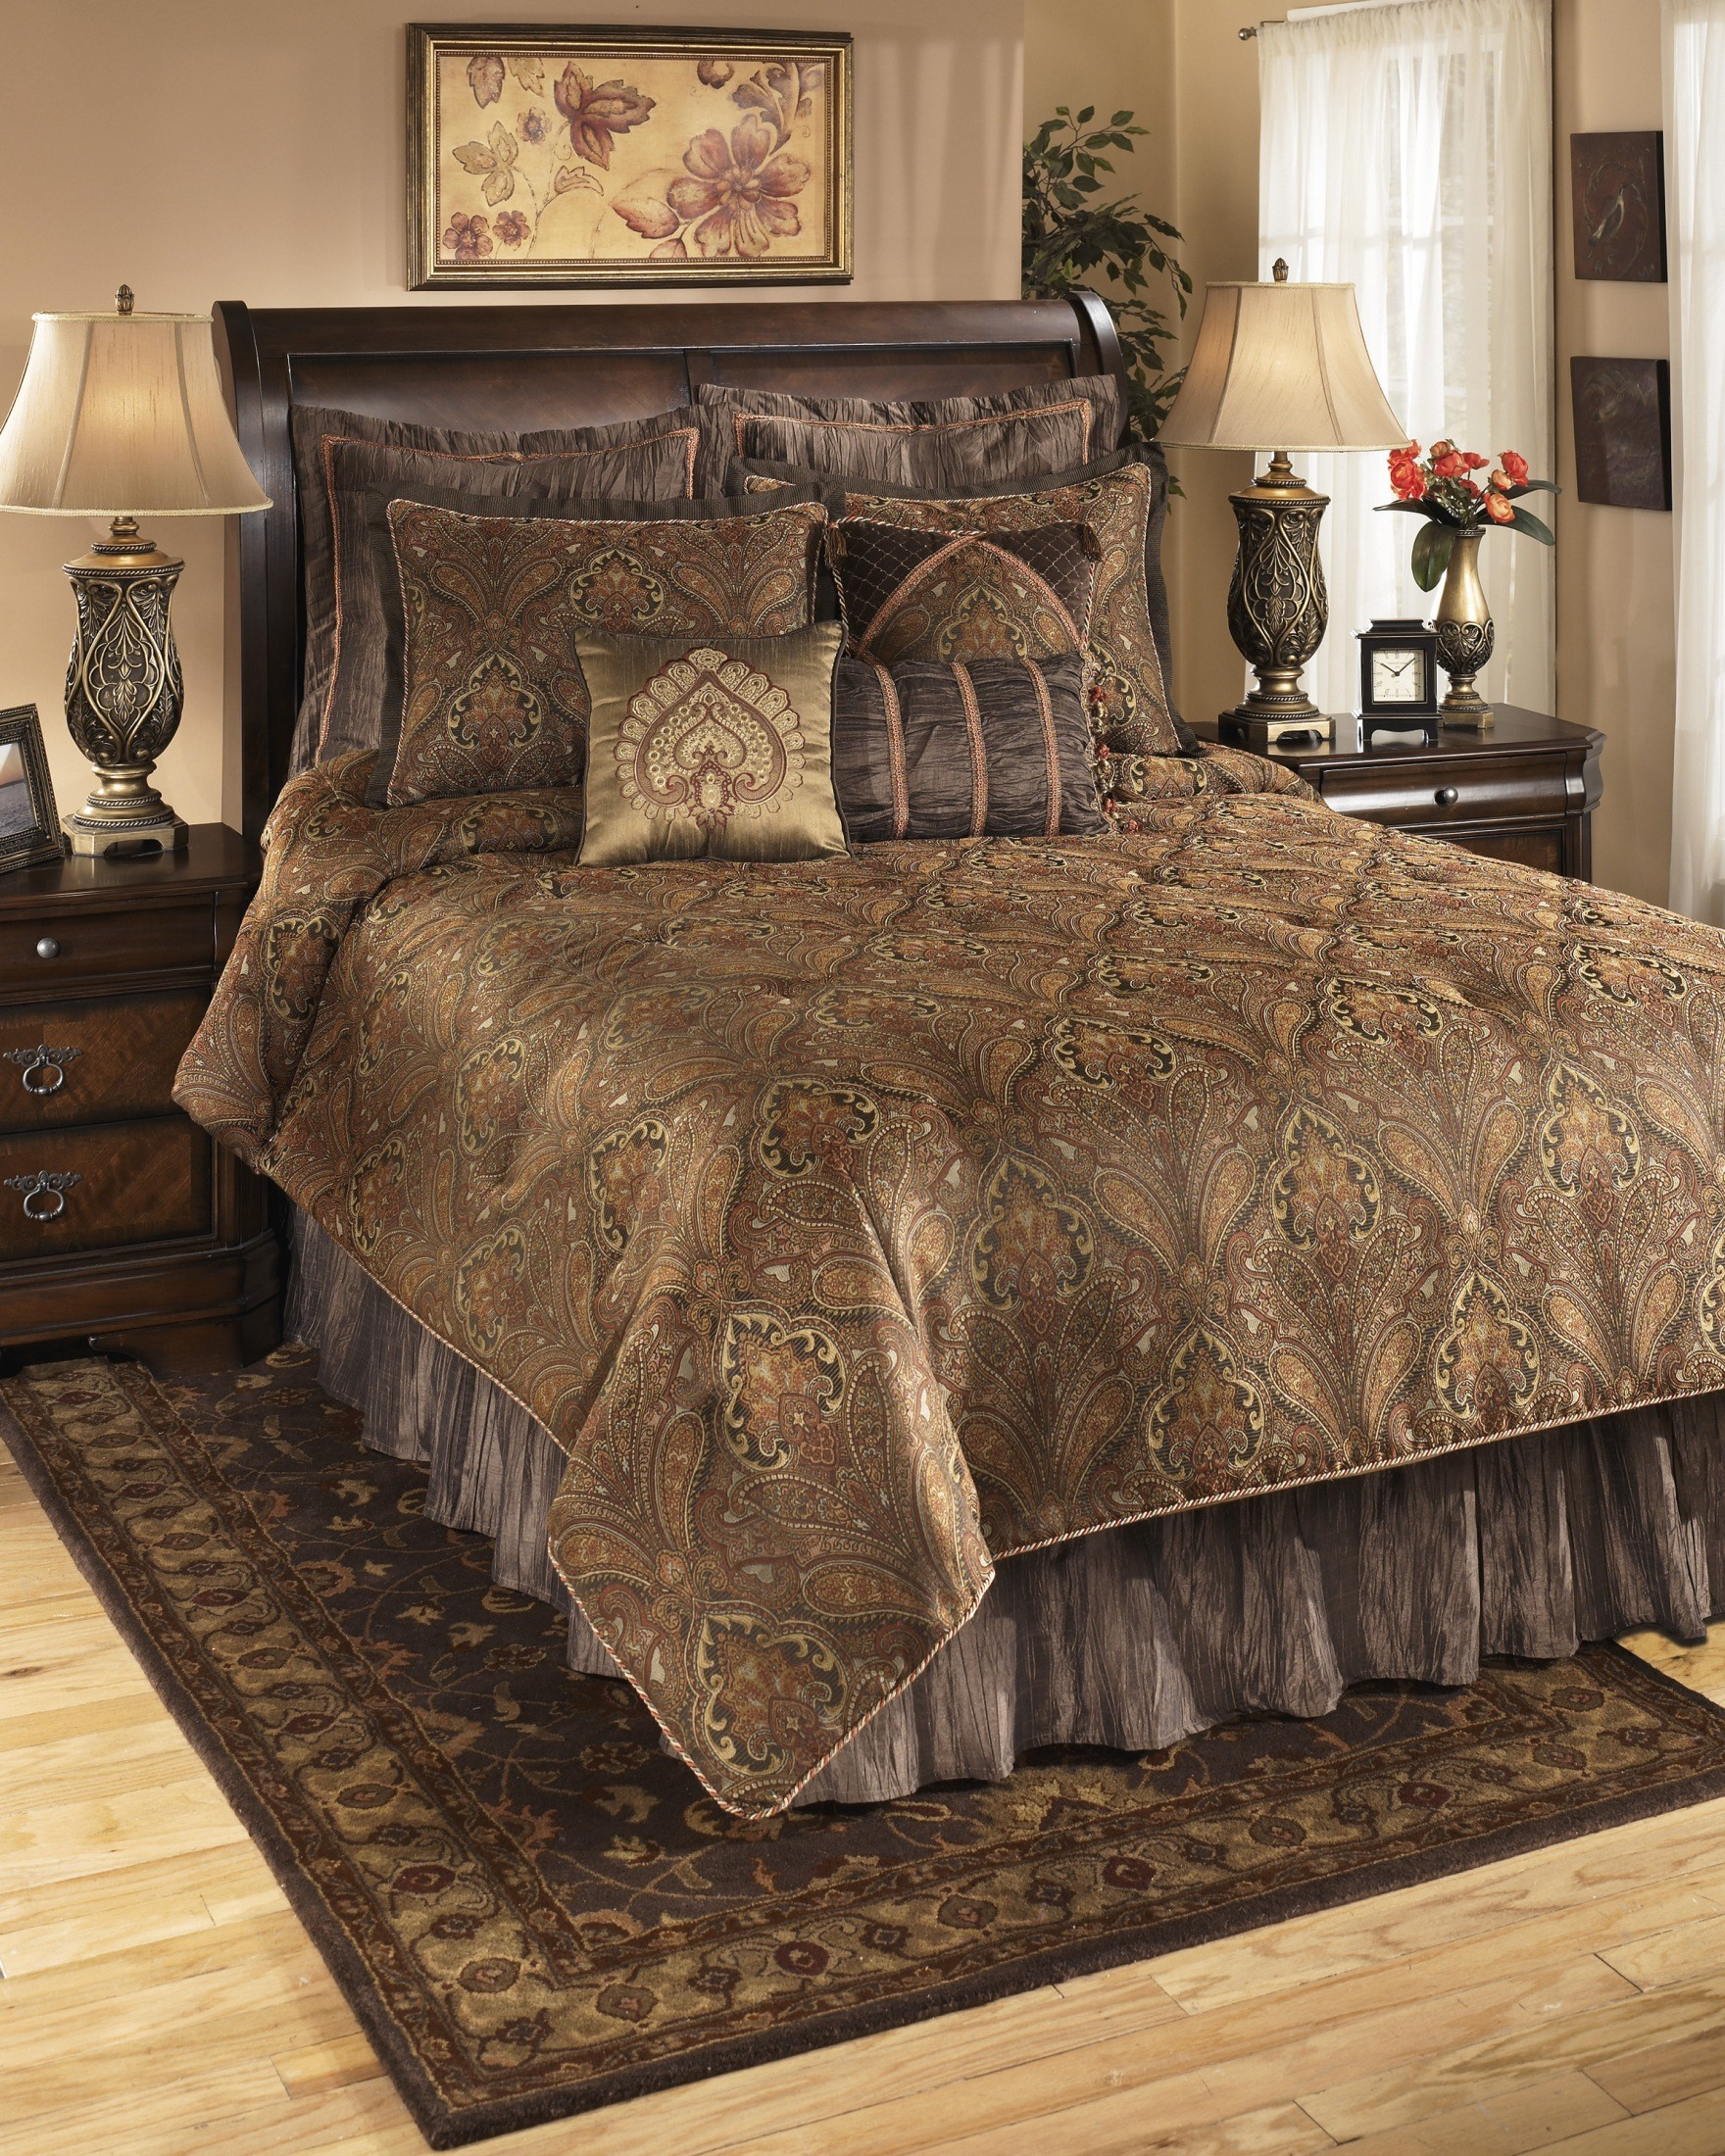 Bellingham moroccan queen bedding set q162005q ashley - King size bedroom sets for sale by owner ...